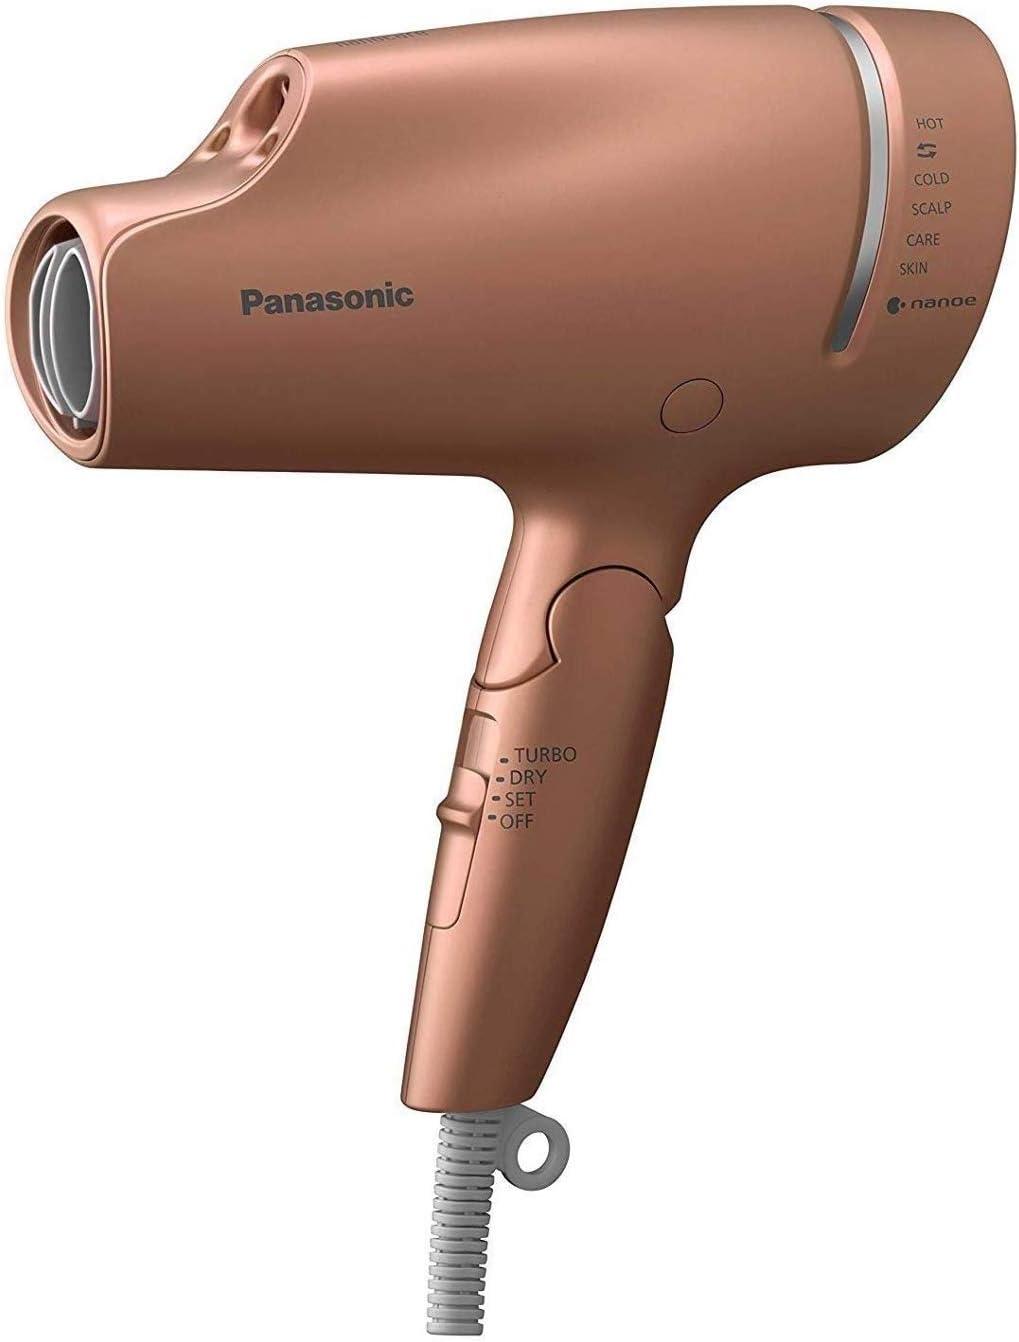 Panasonic EH-NA9A-CN hair dryer nano care kappa gold [1200W] (Japan Domestic genuine products)